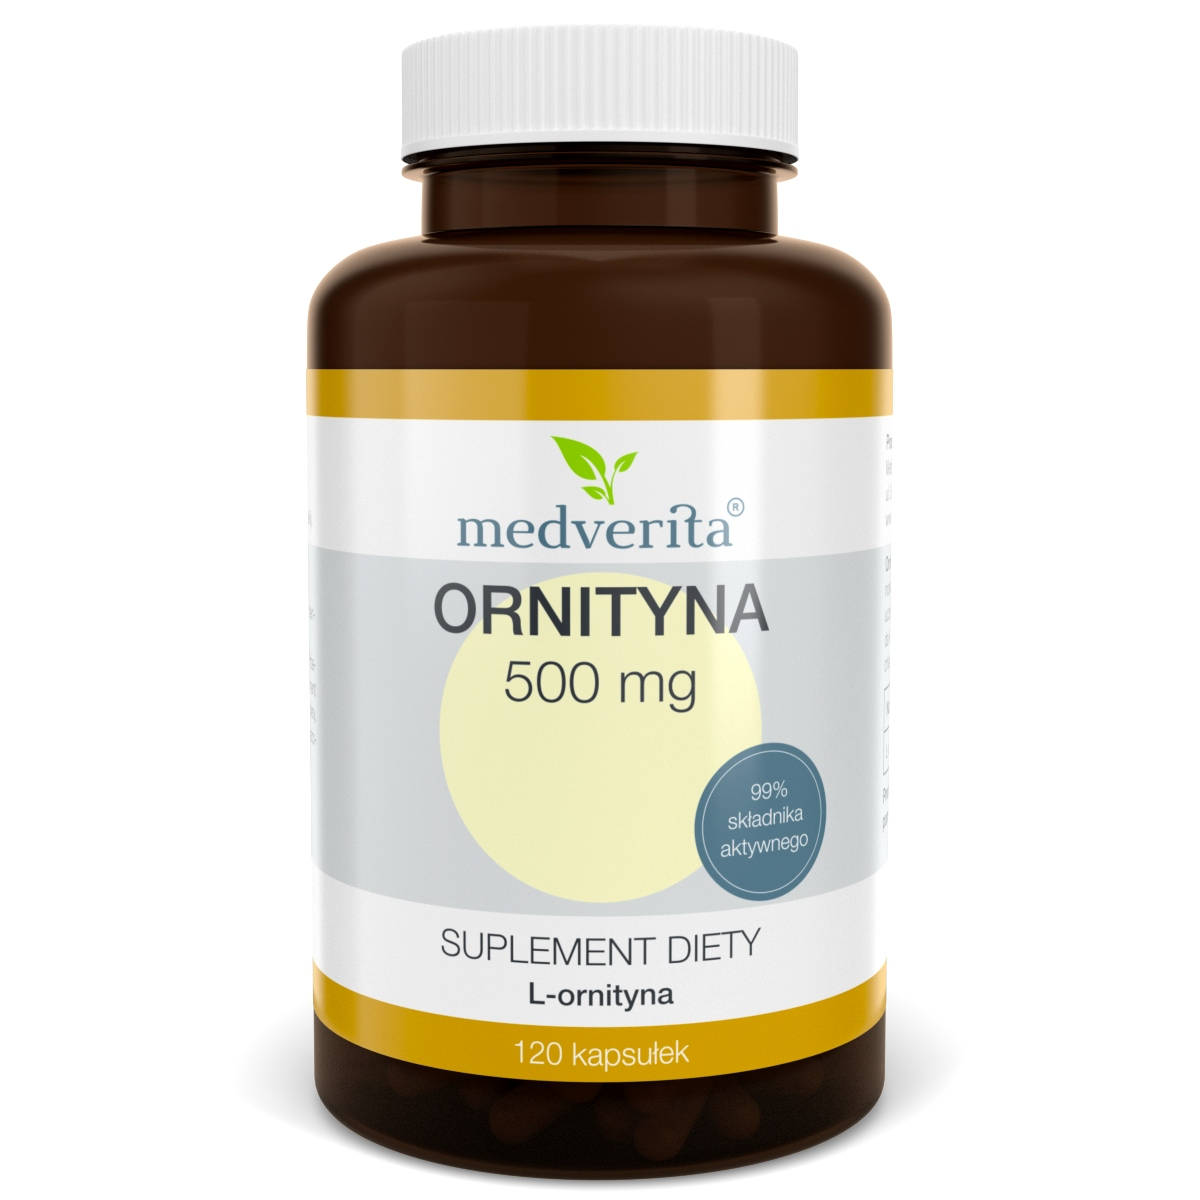 ORNITYNA 500 mg L-ornityna HCL - 120 kapsułek